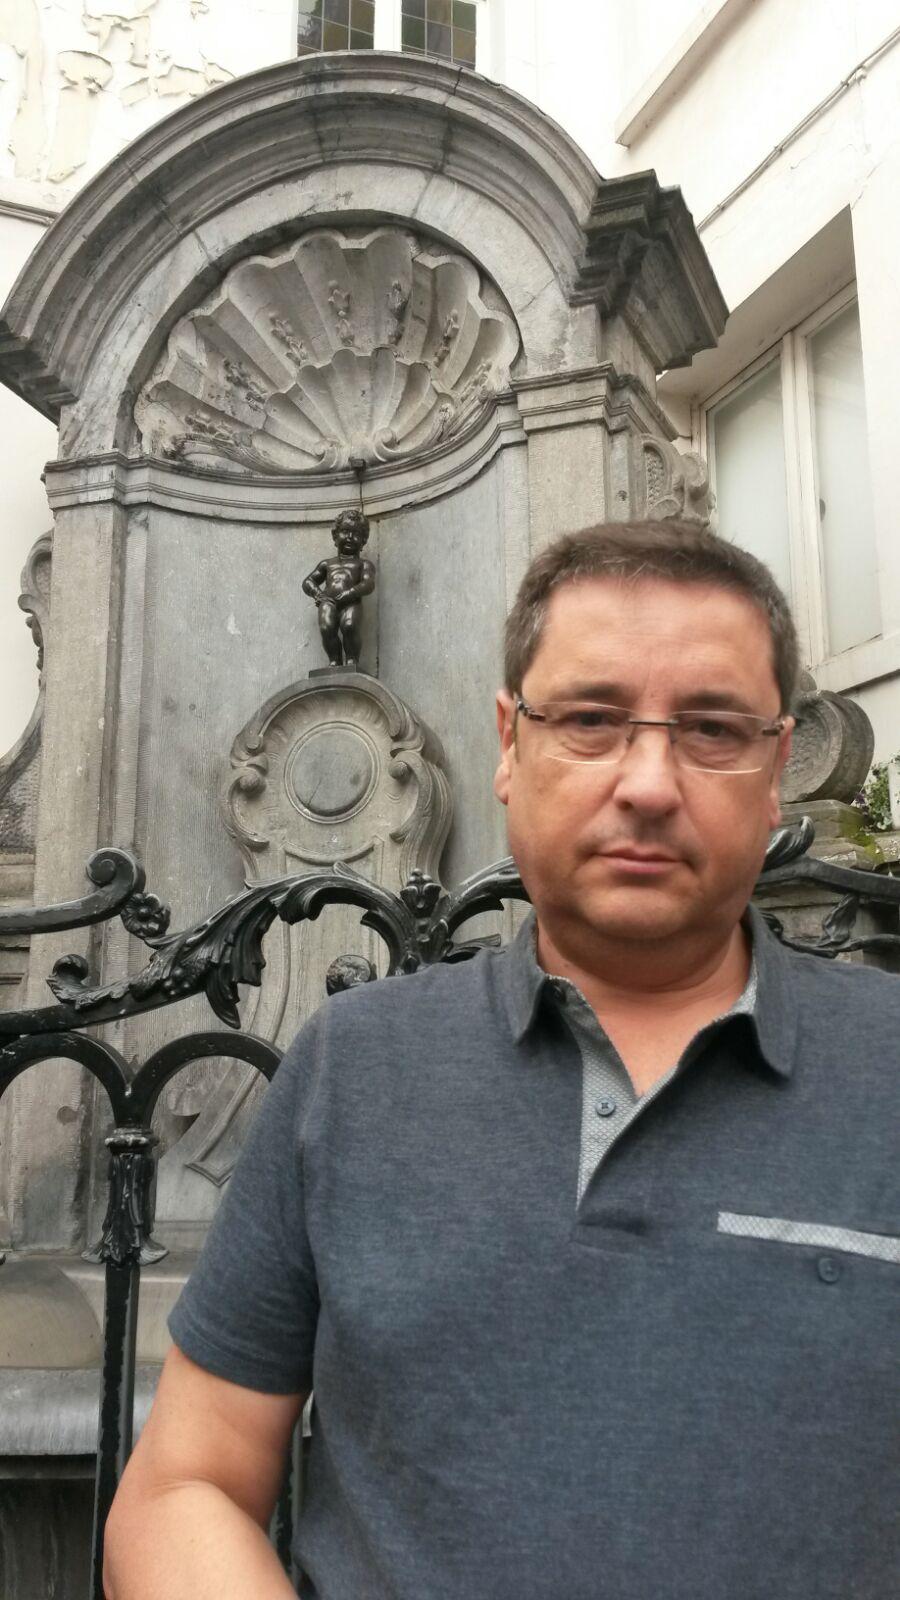 Alfonso junto a la escultura Manneken pis en Bruselas.